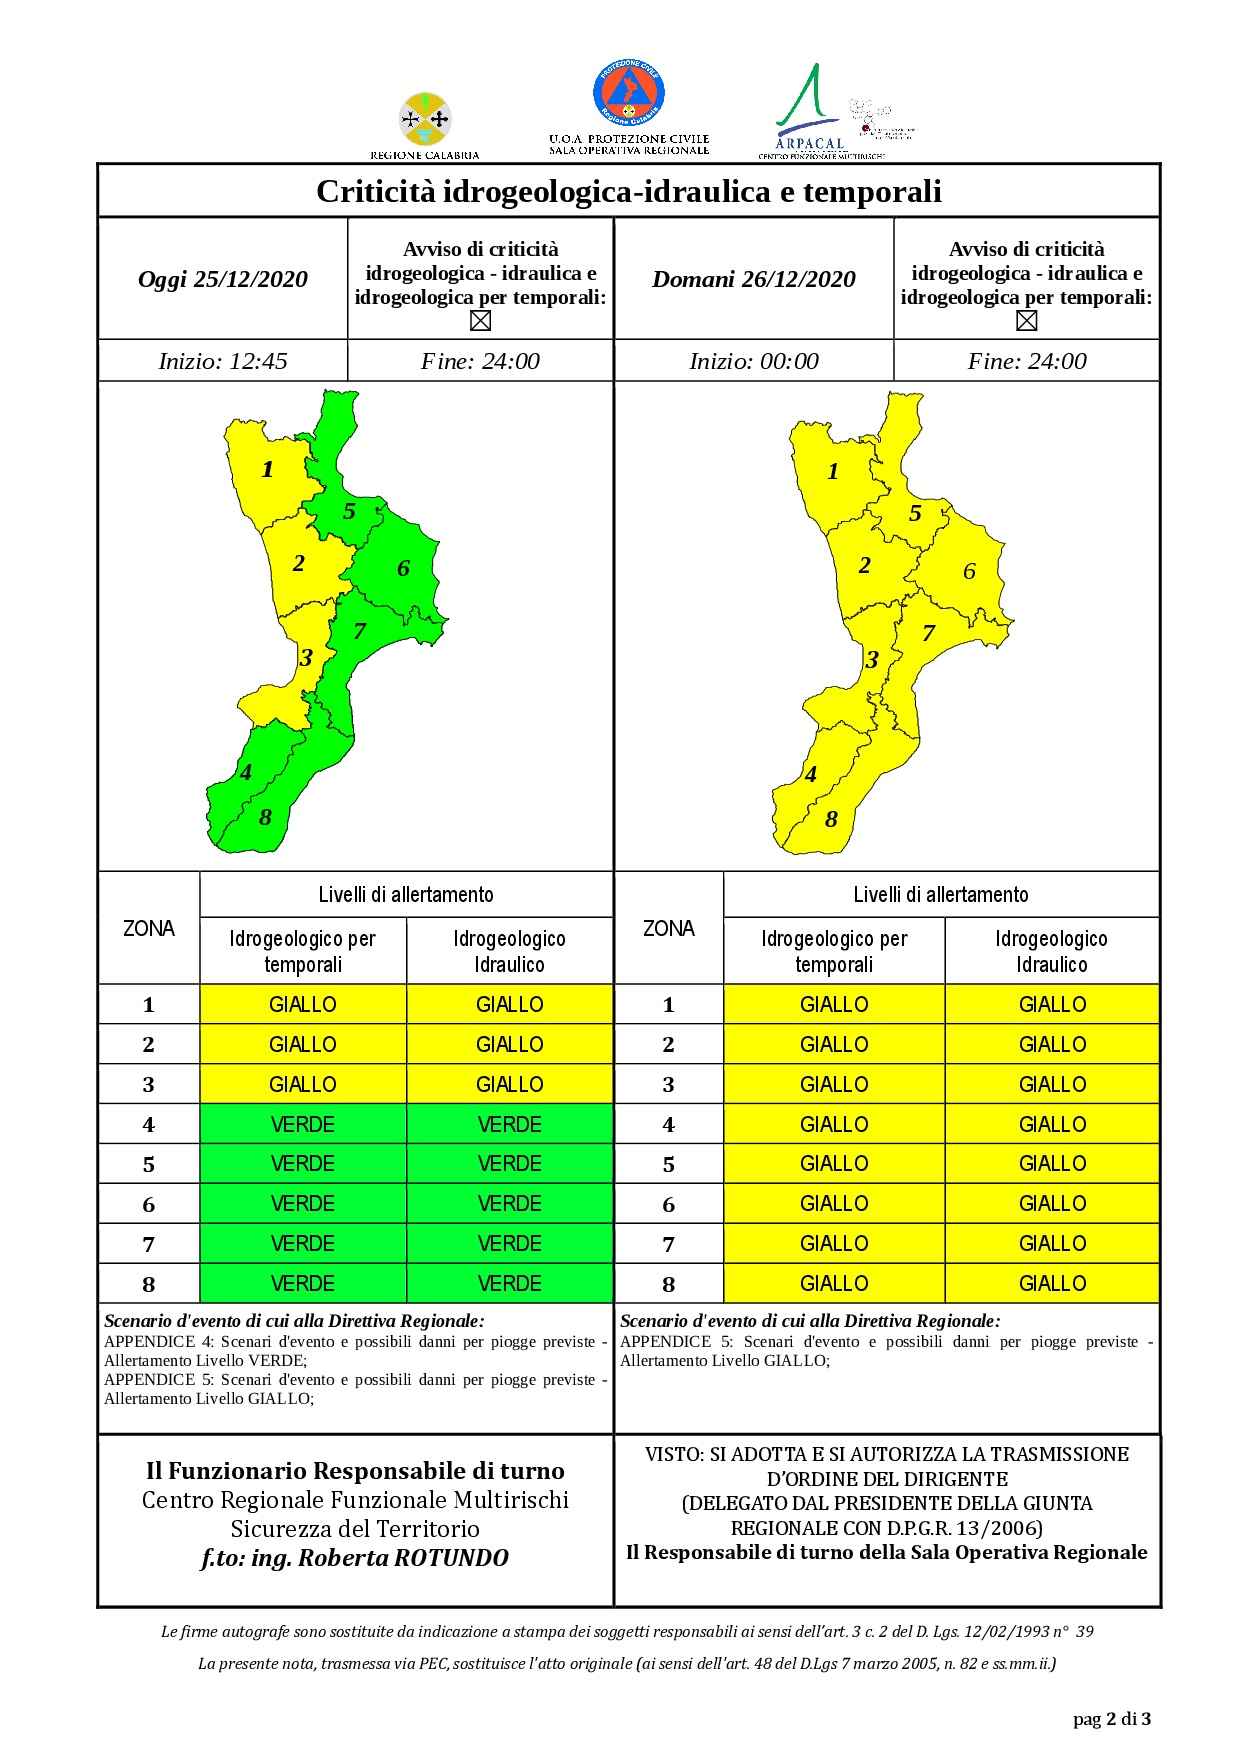 Criticità idrogeologica-idraulica e temporali in Calabria 25-12-2020